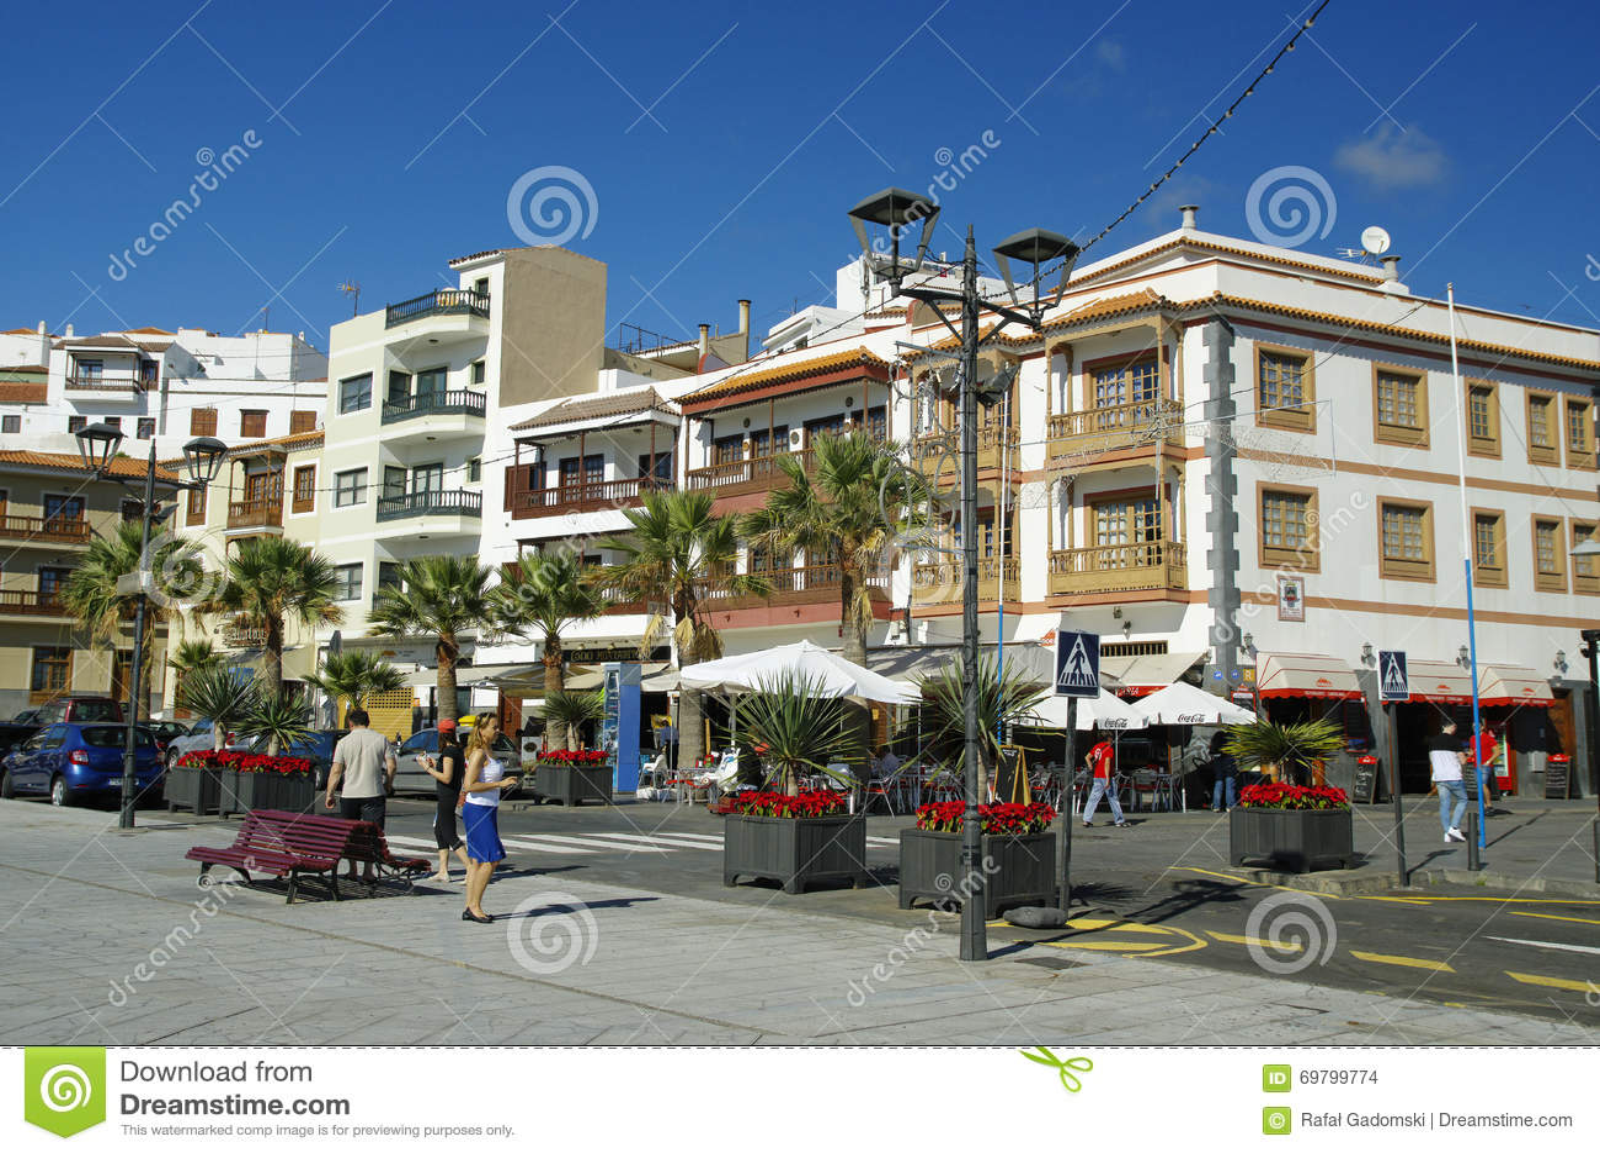 Narrow street in Candelaria